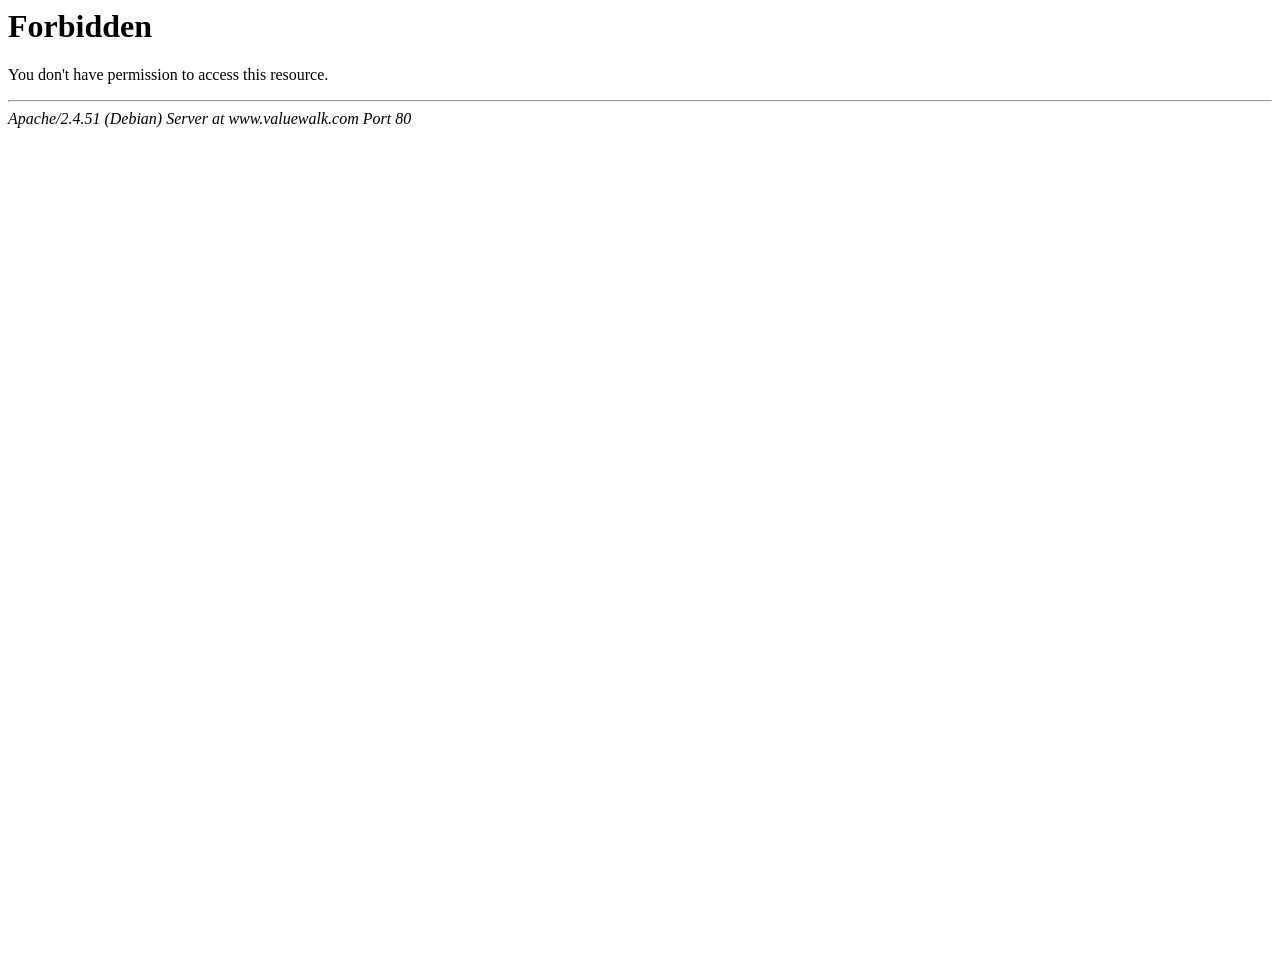 Herbalife Ltd. (HLF) Responds To 'Leaked' Survey Report